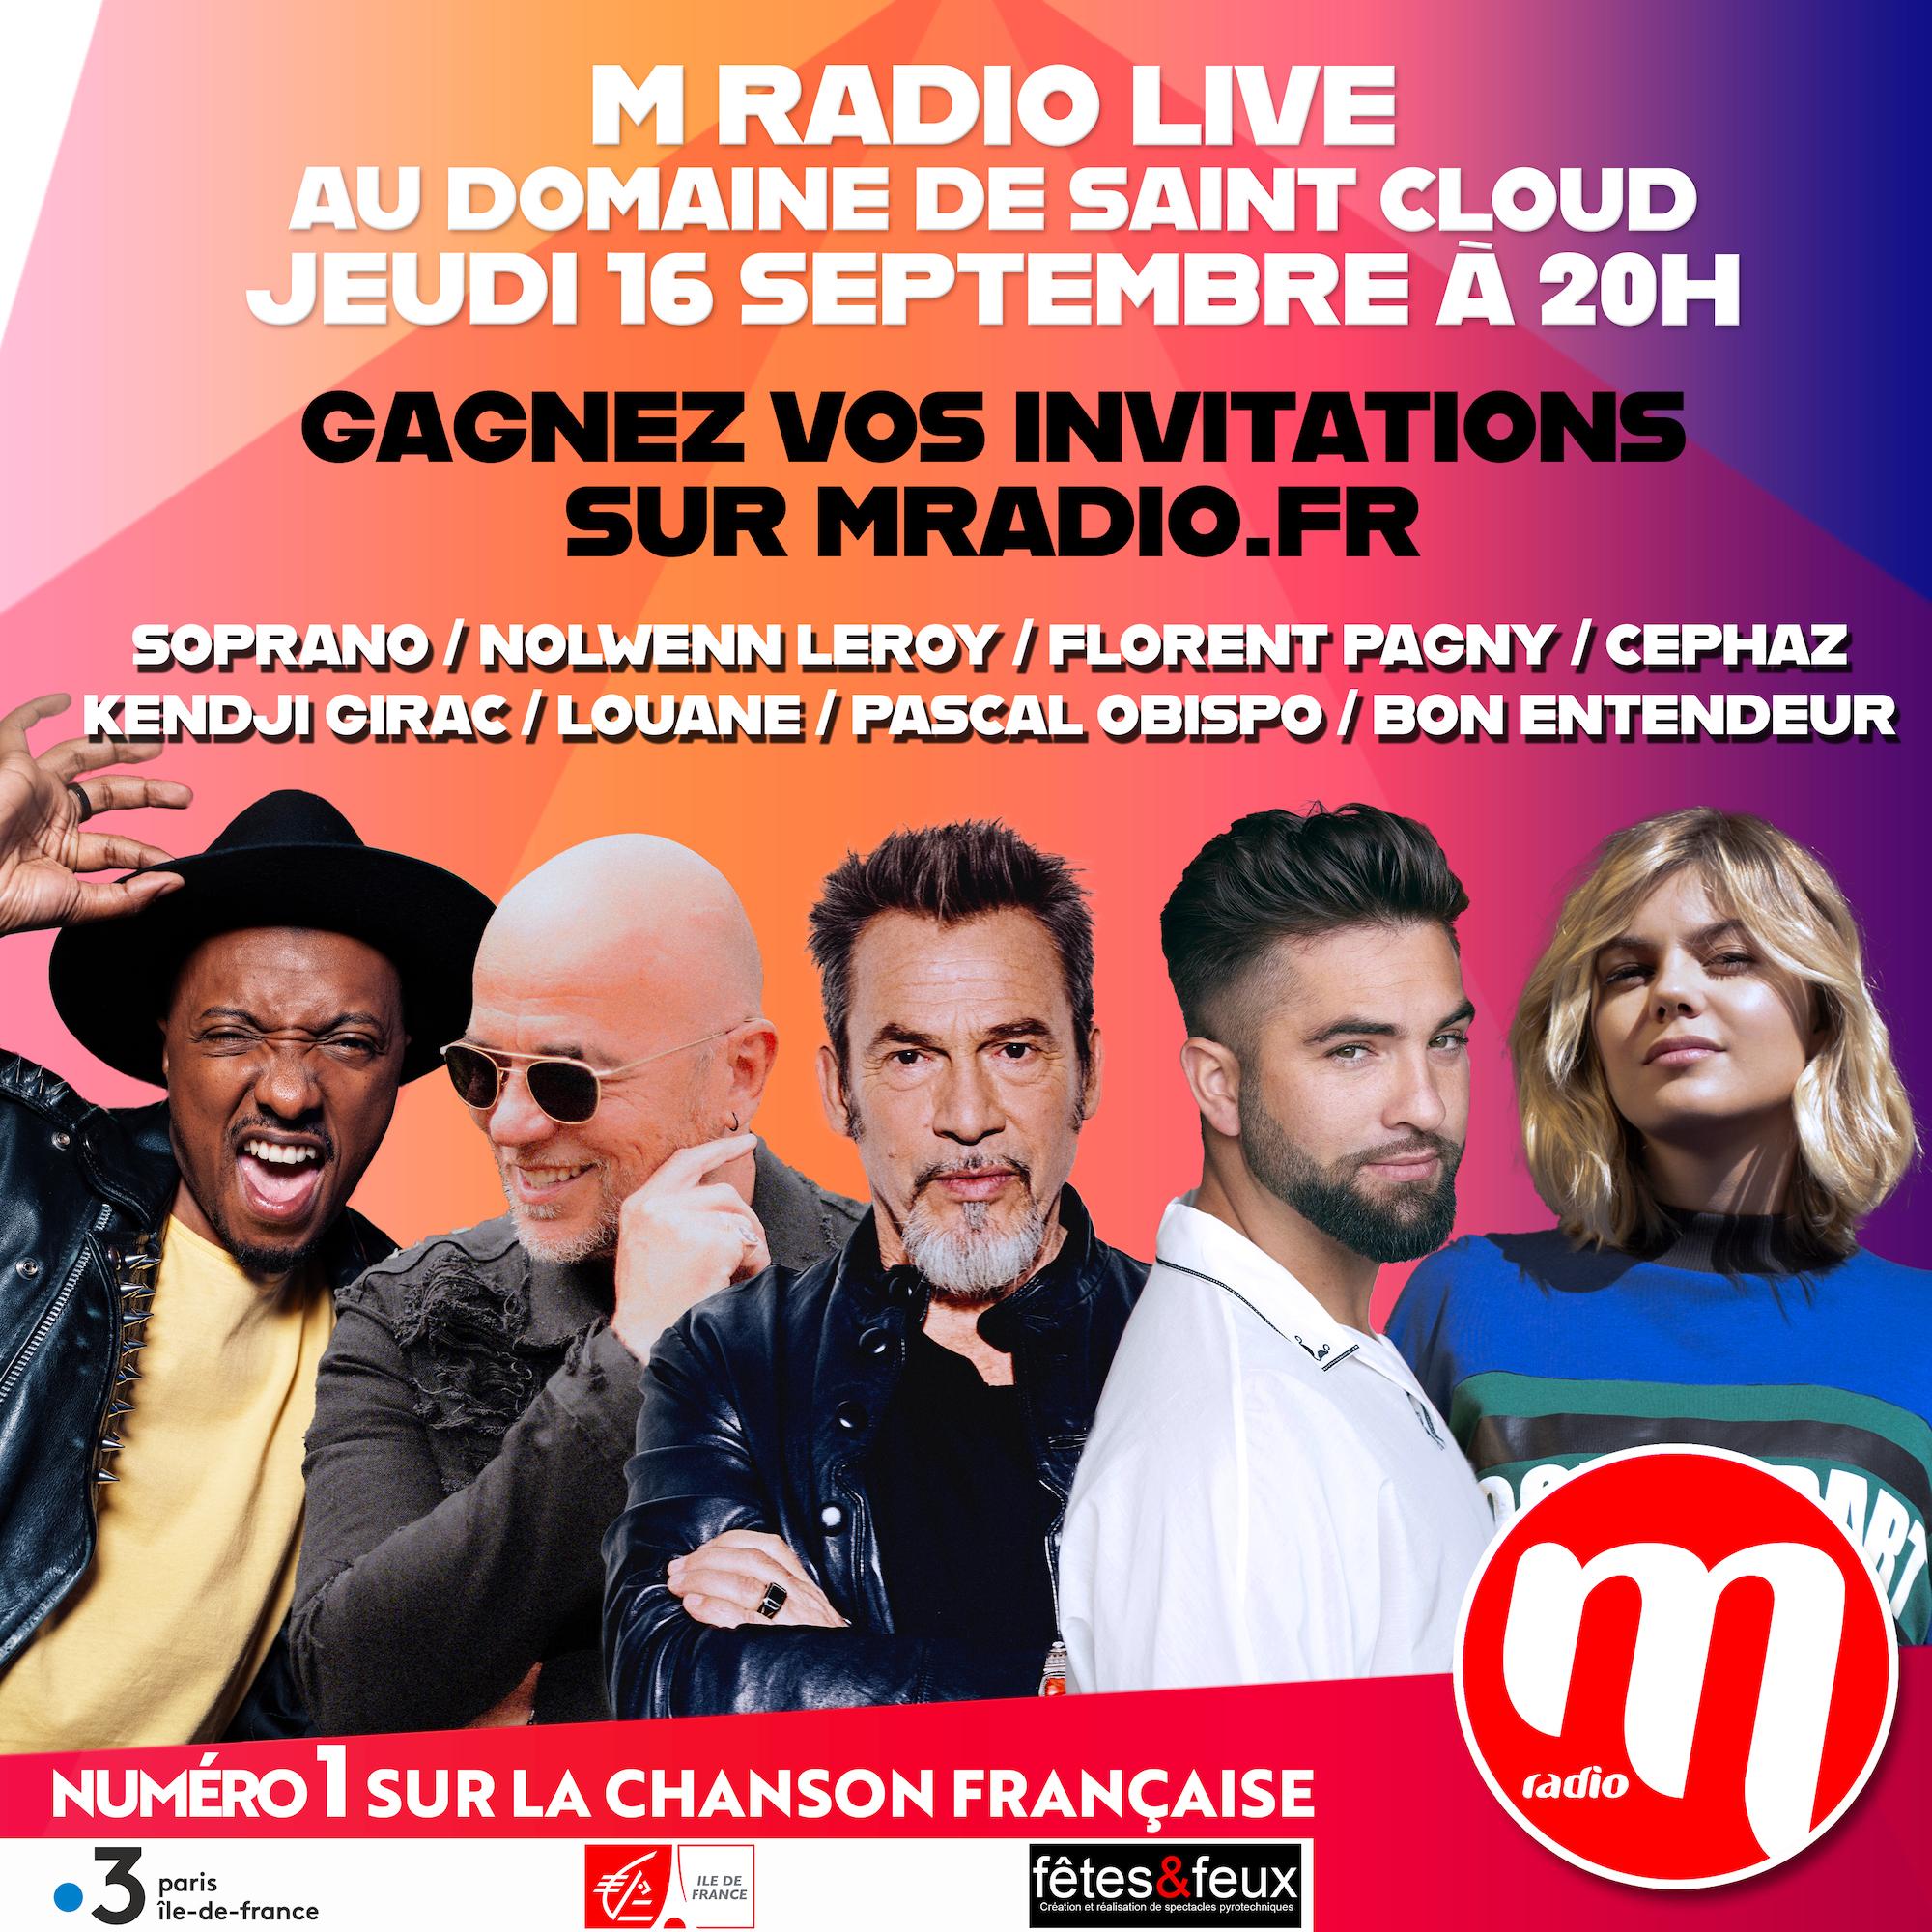 M Radio prépare un grand concert